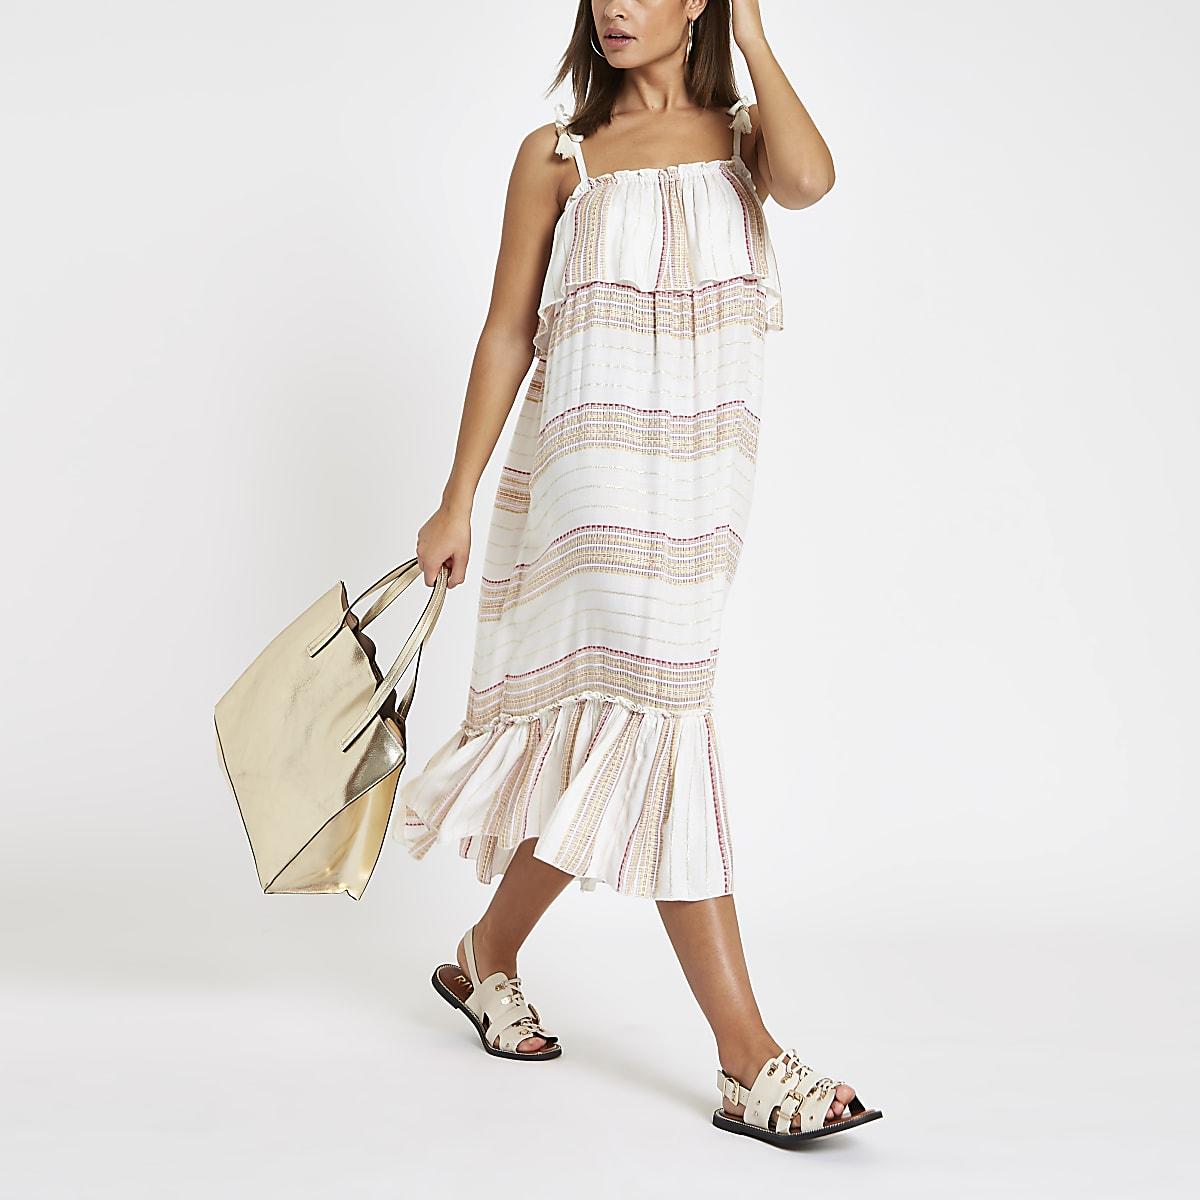 d4276215efff2 Cream stripe oversized midi beach dress - Caftans & Beach Cover-Ups -  Swimwear & Beachwear - women